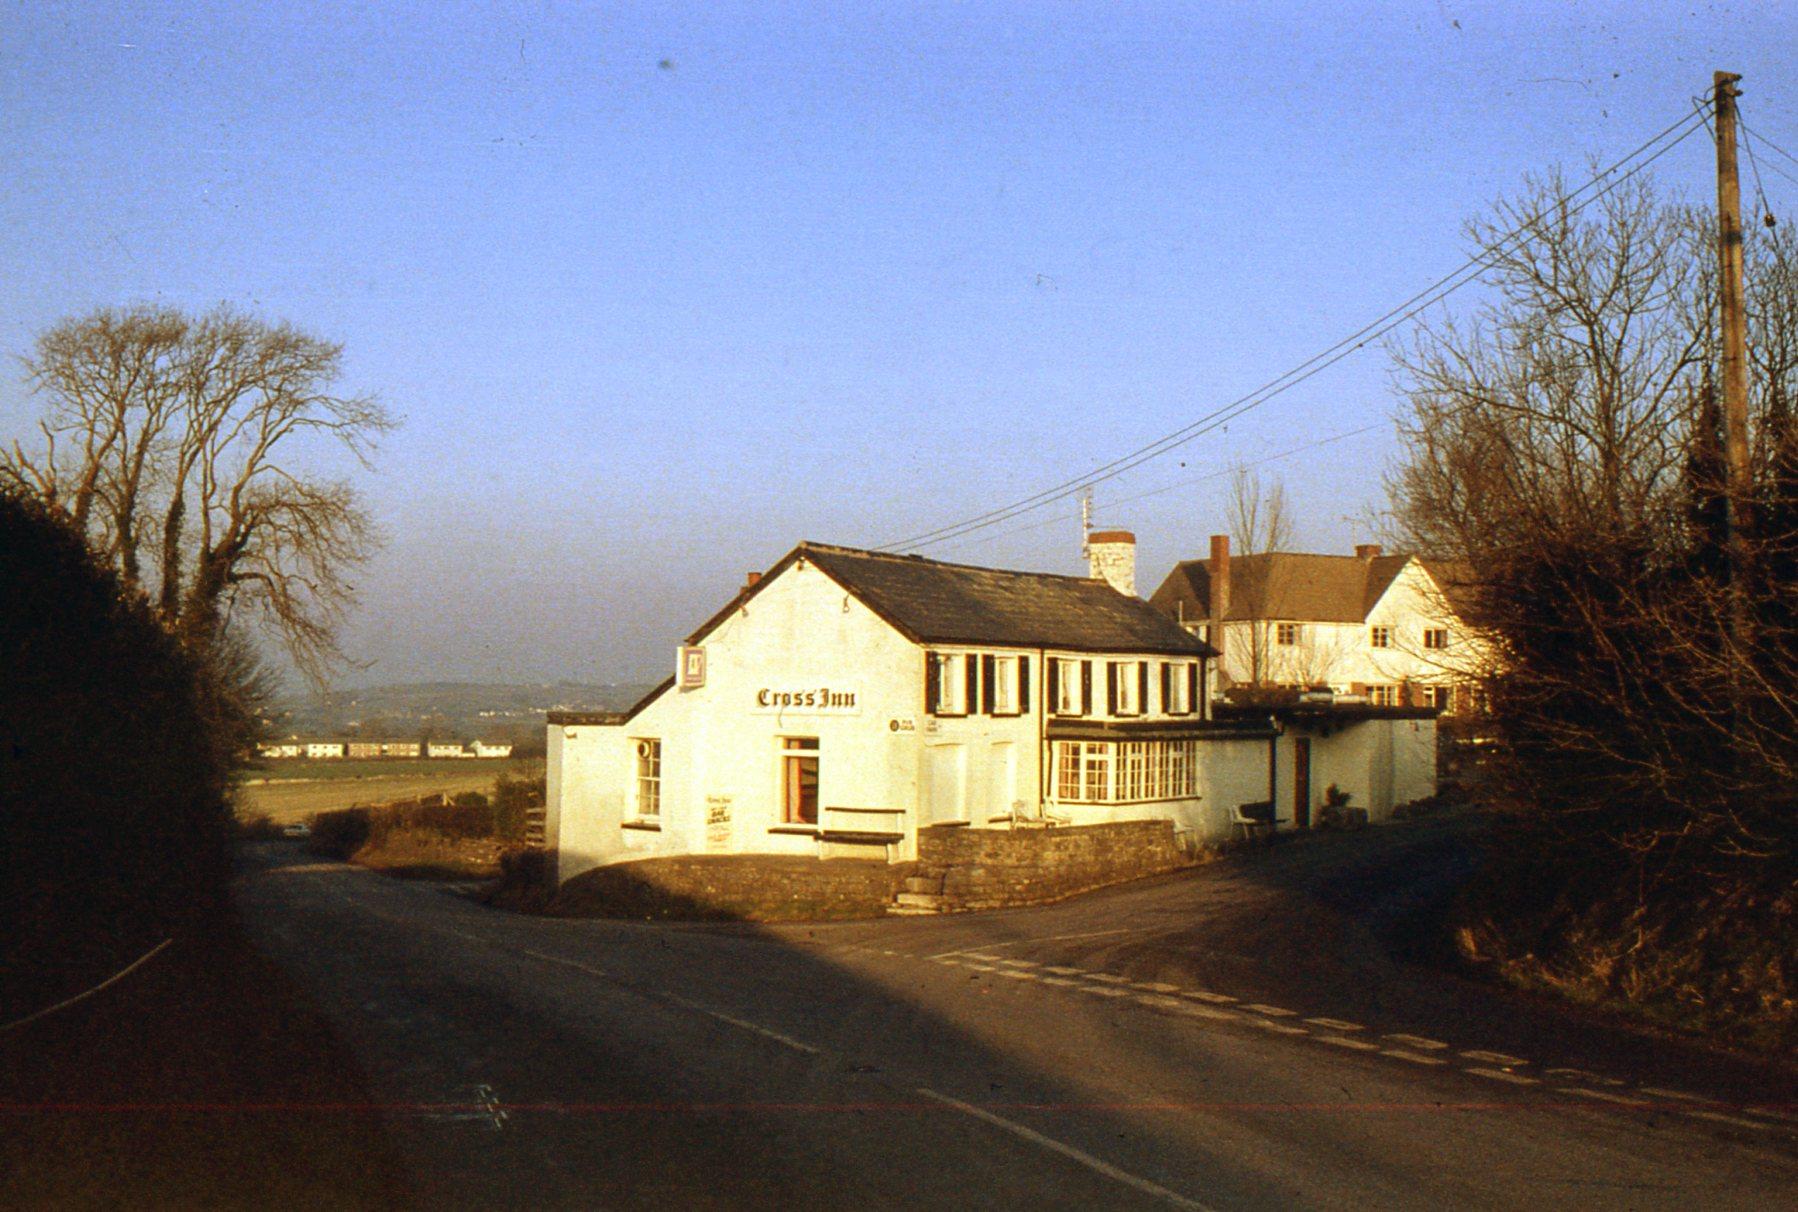 Llanblethian, South Glamorgan, Wales